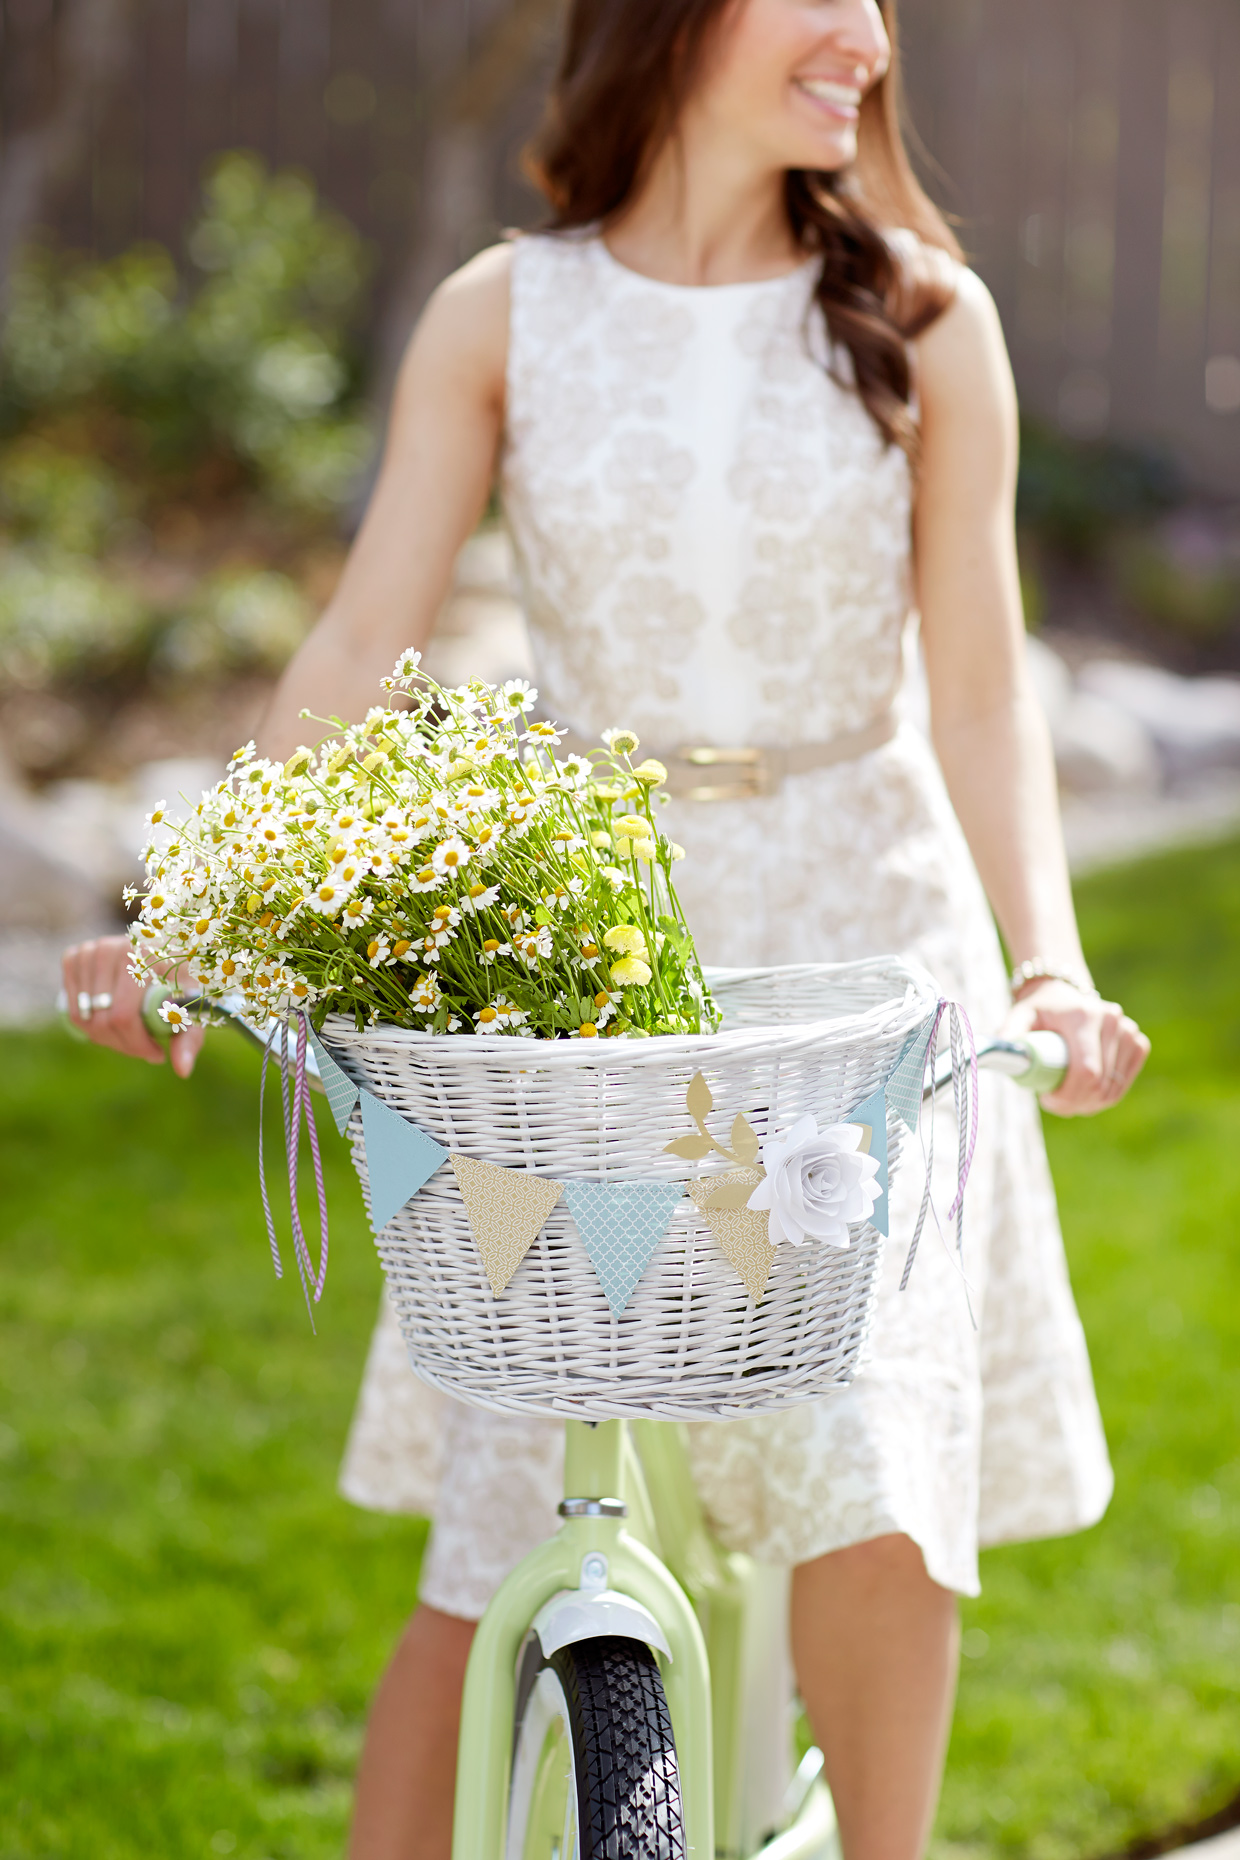 Lifestyle photography Derek Israelsen Flowers Basket